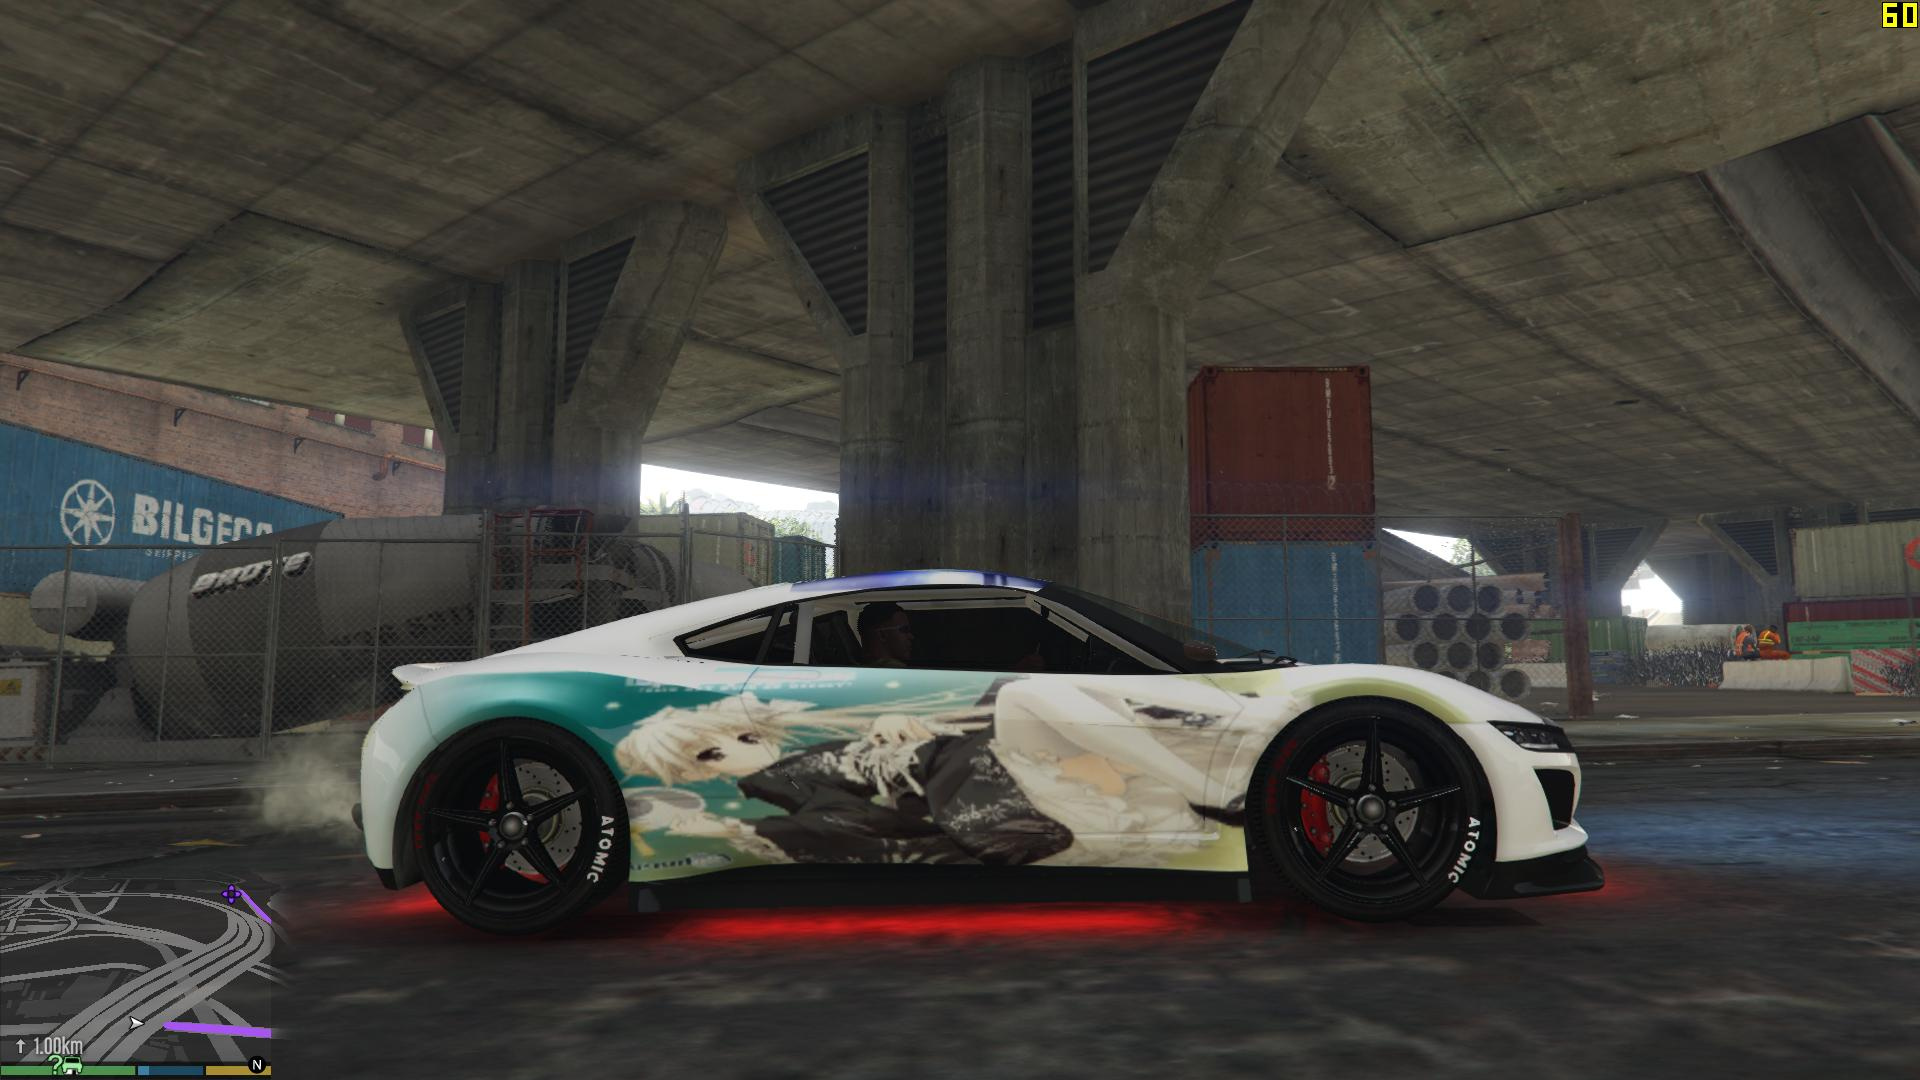 Kasugano Sora paint job - GTA5-Mods.com